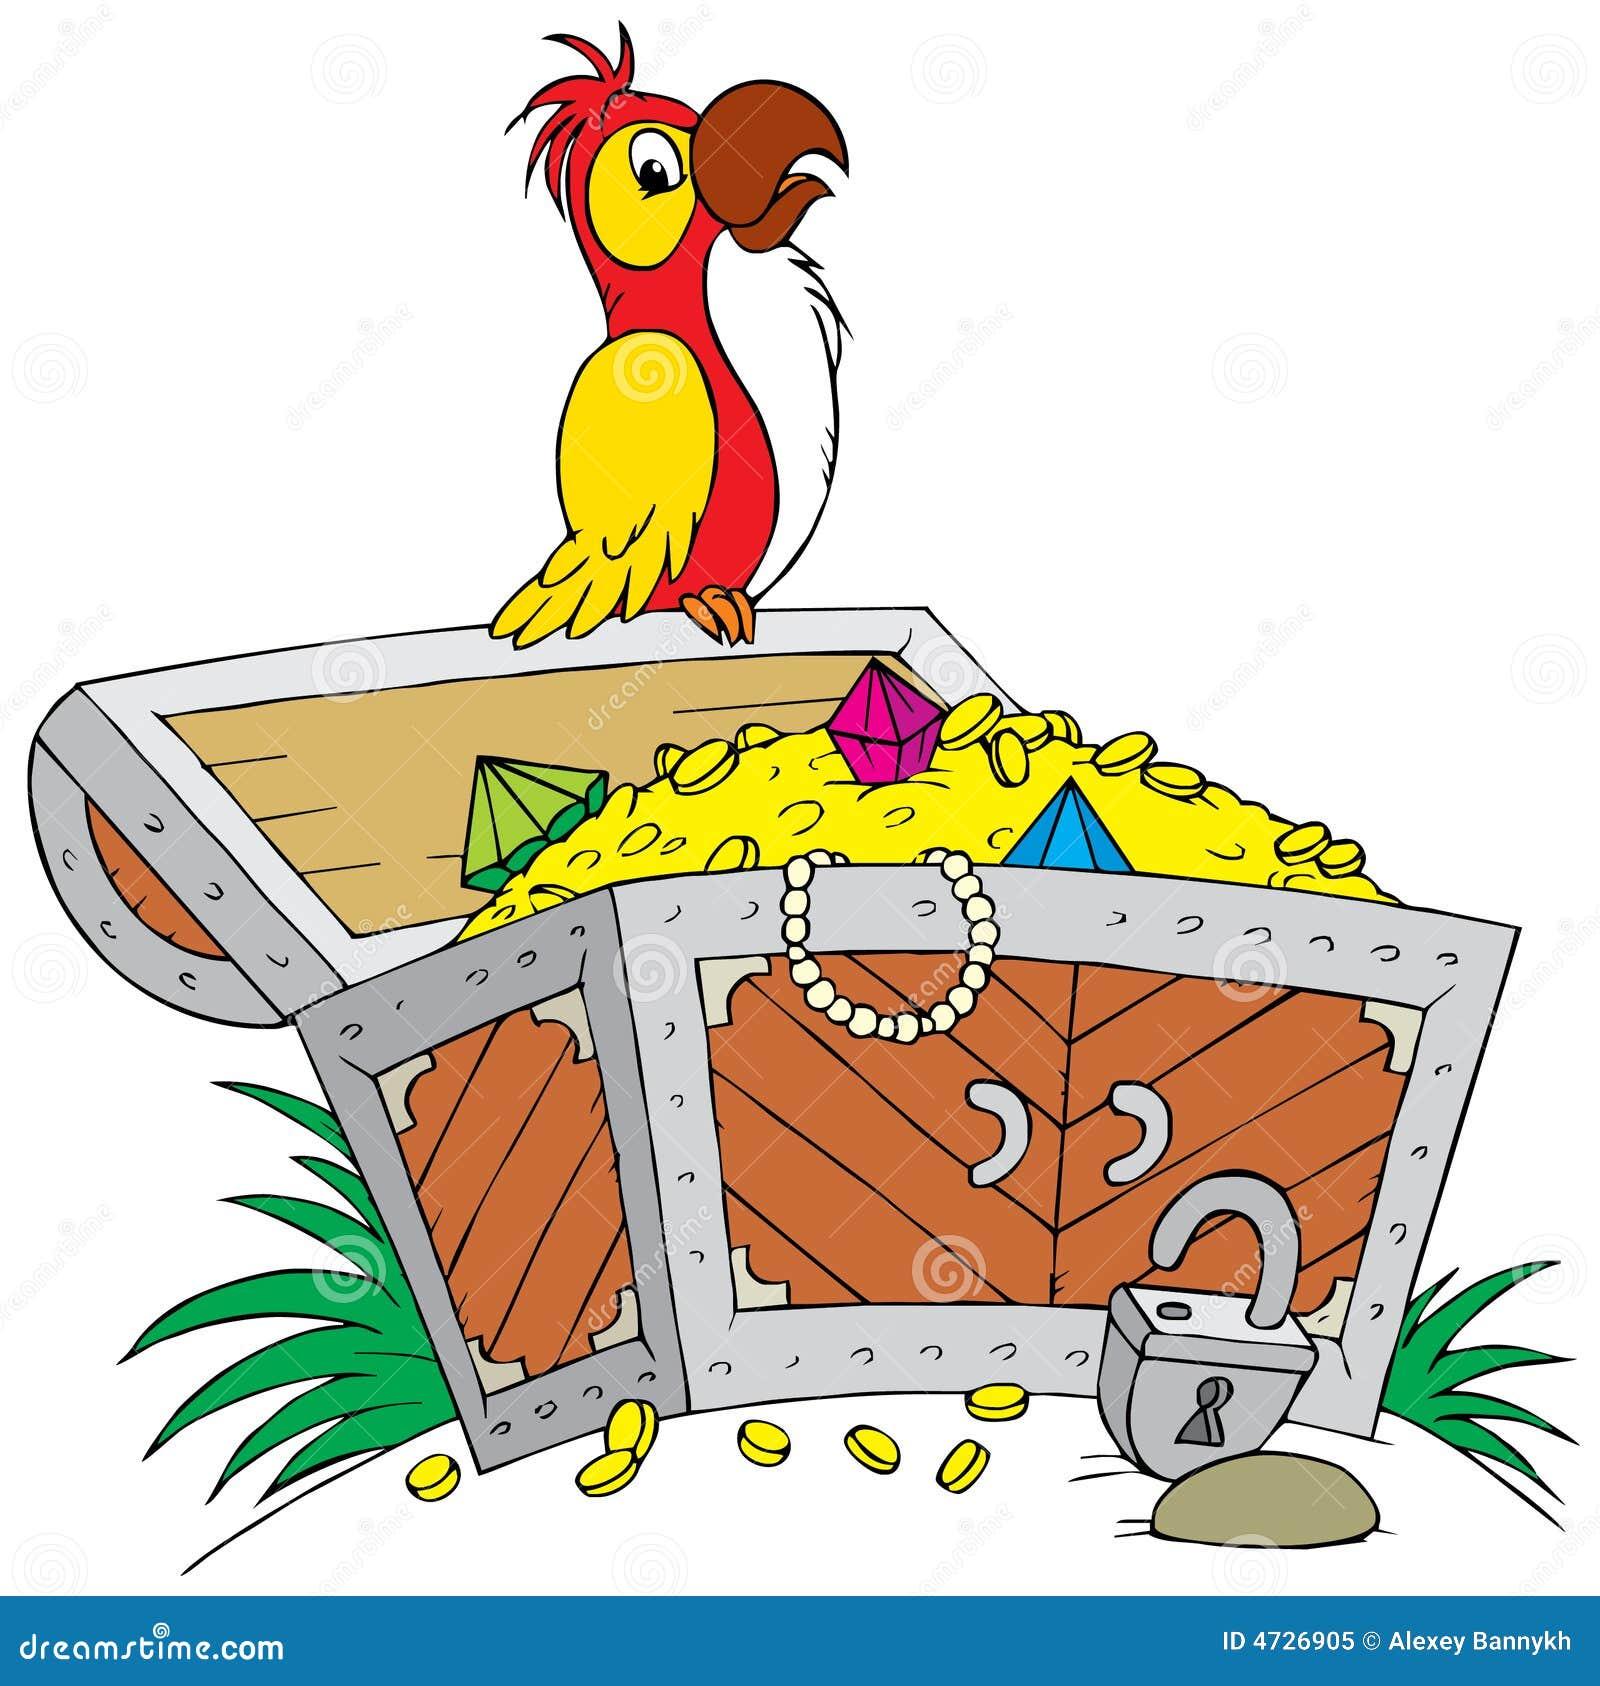 Treasure stock vector. Illustration of cartoon, humorous ...